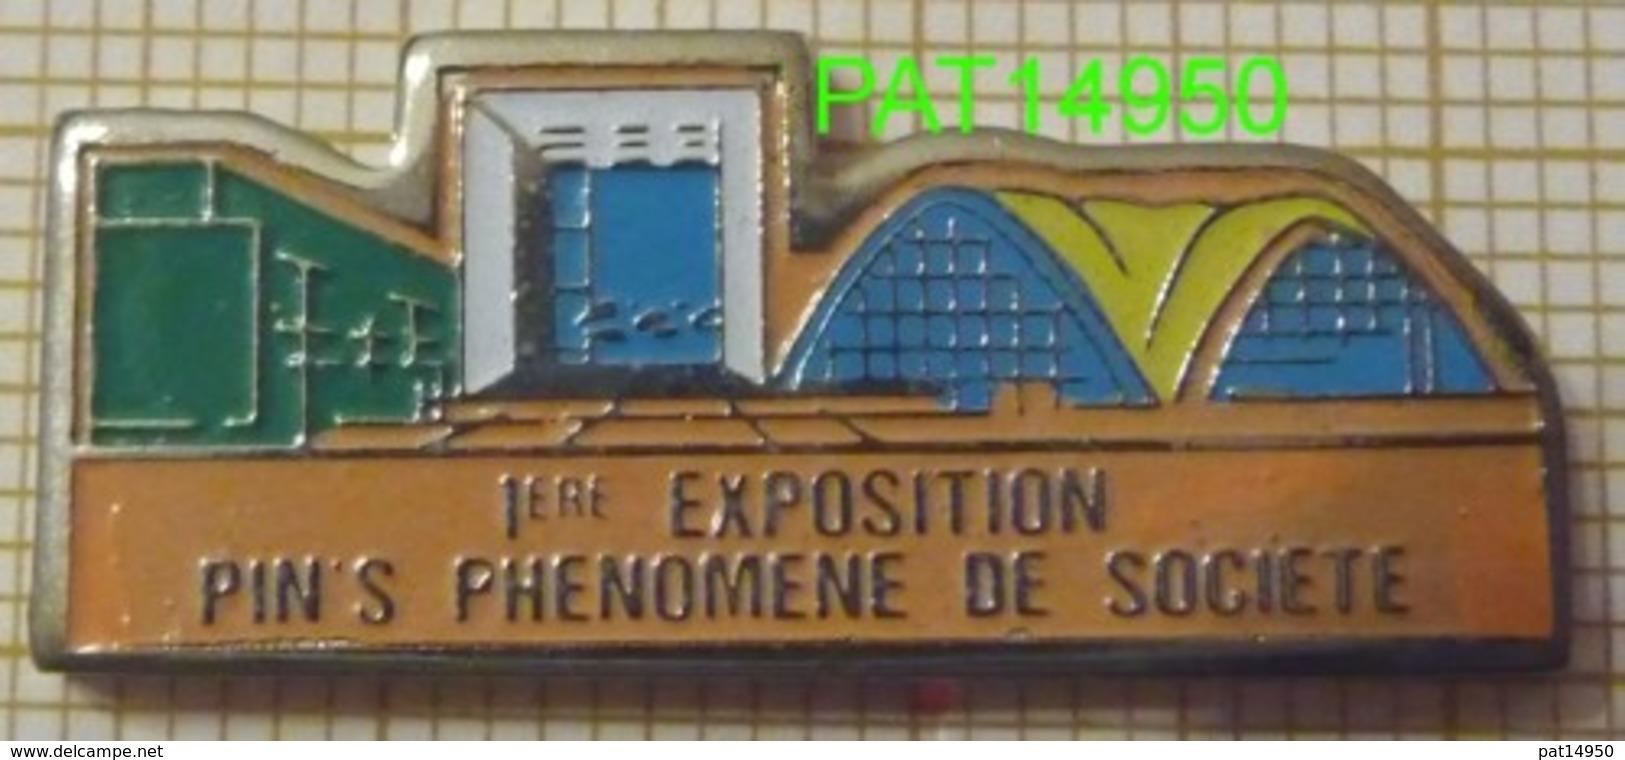 1ere EXPOSITION PIN'S PHENOMENE De SOCIETE Au  CNIT & ARCHE De LA DEFENSE PINS - Verenigingen